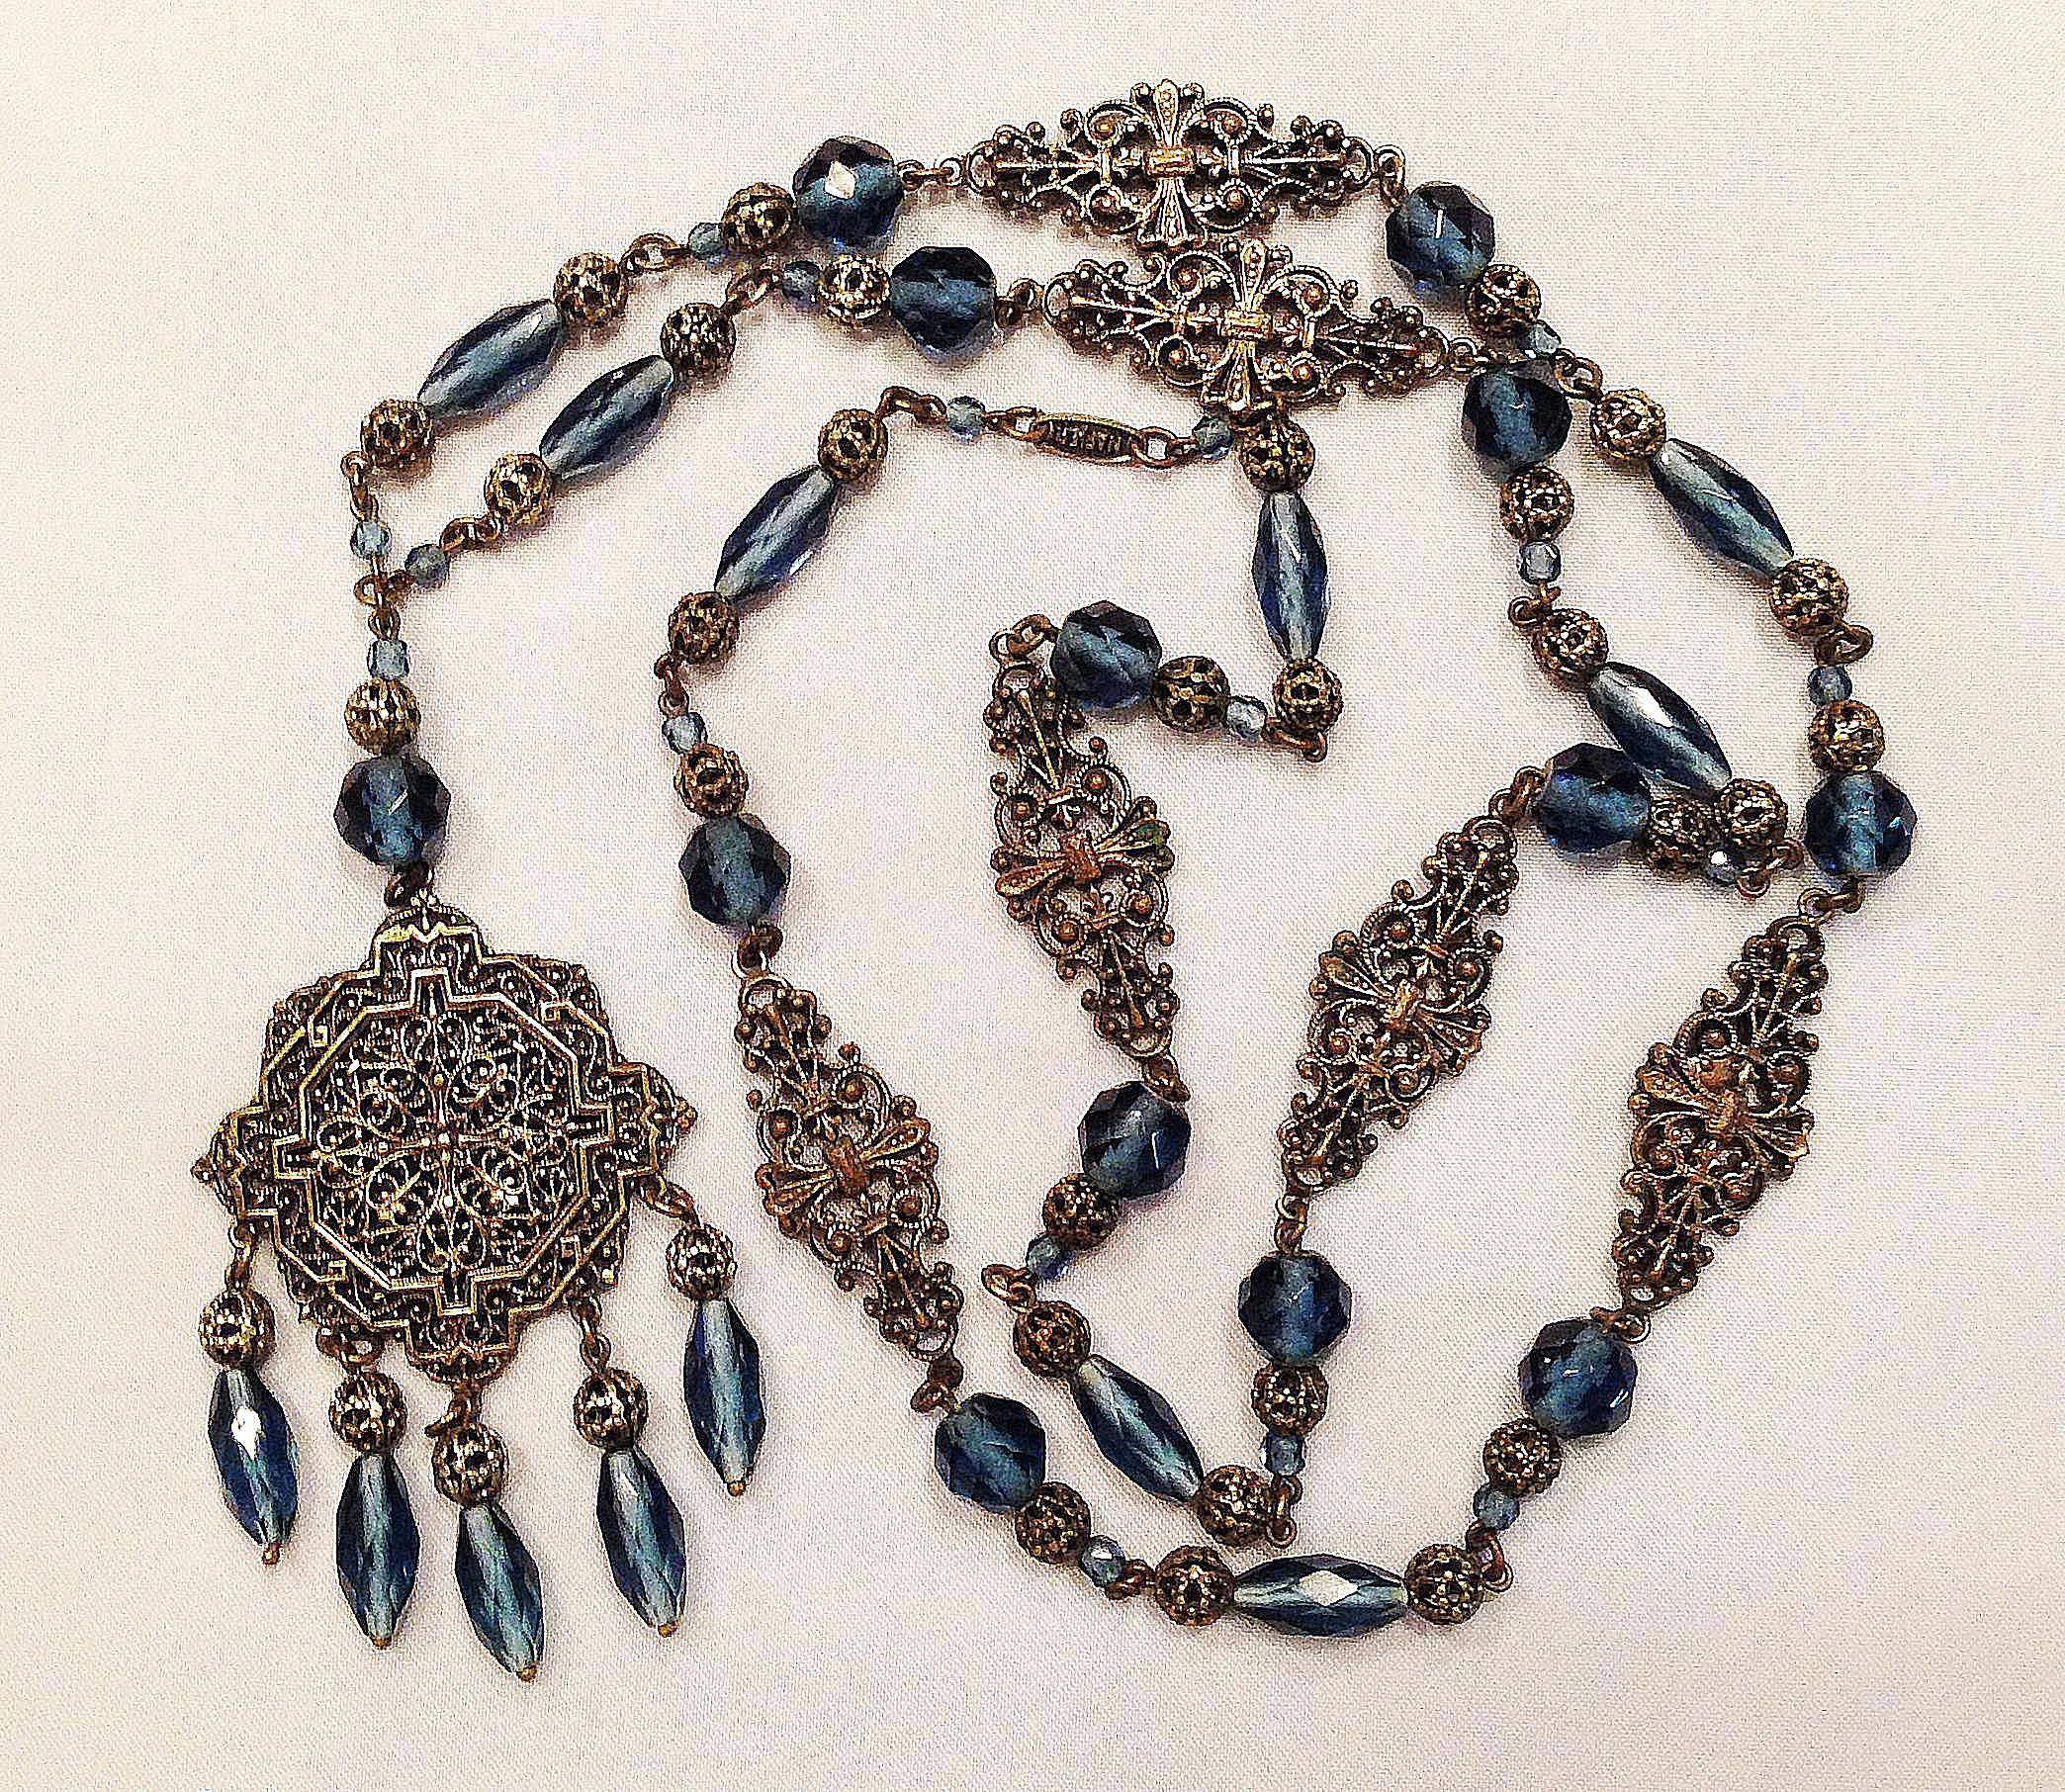 Beaded Filigree Napier 1920s Sautoir Necklace